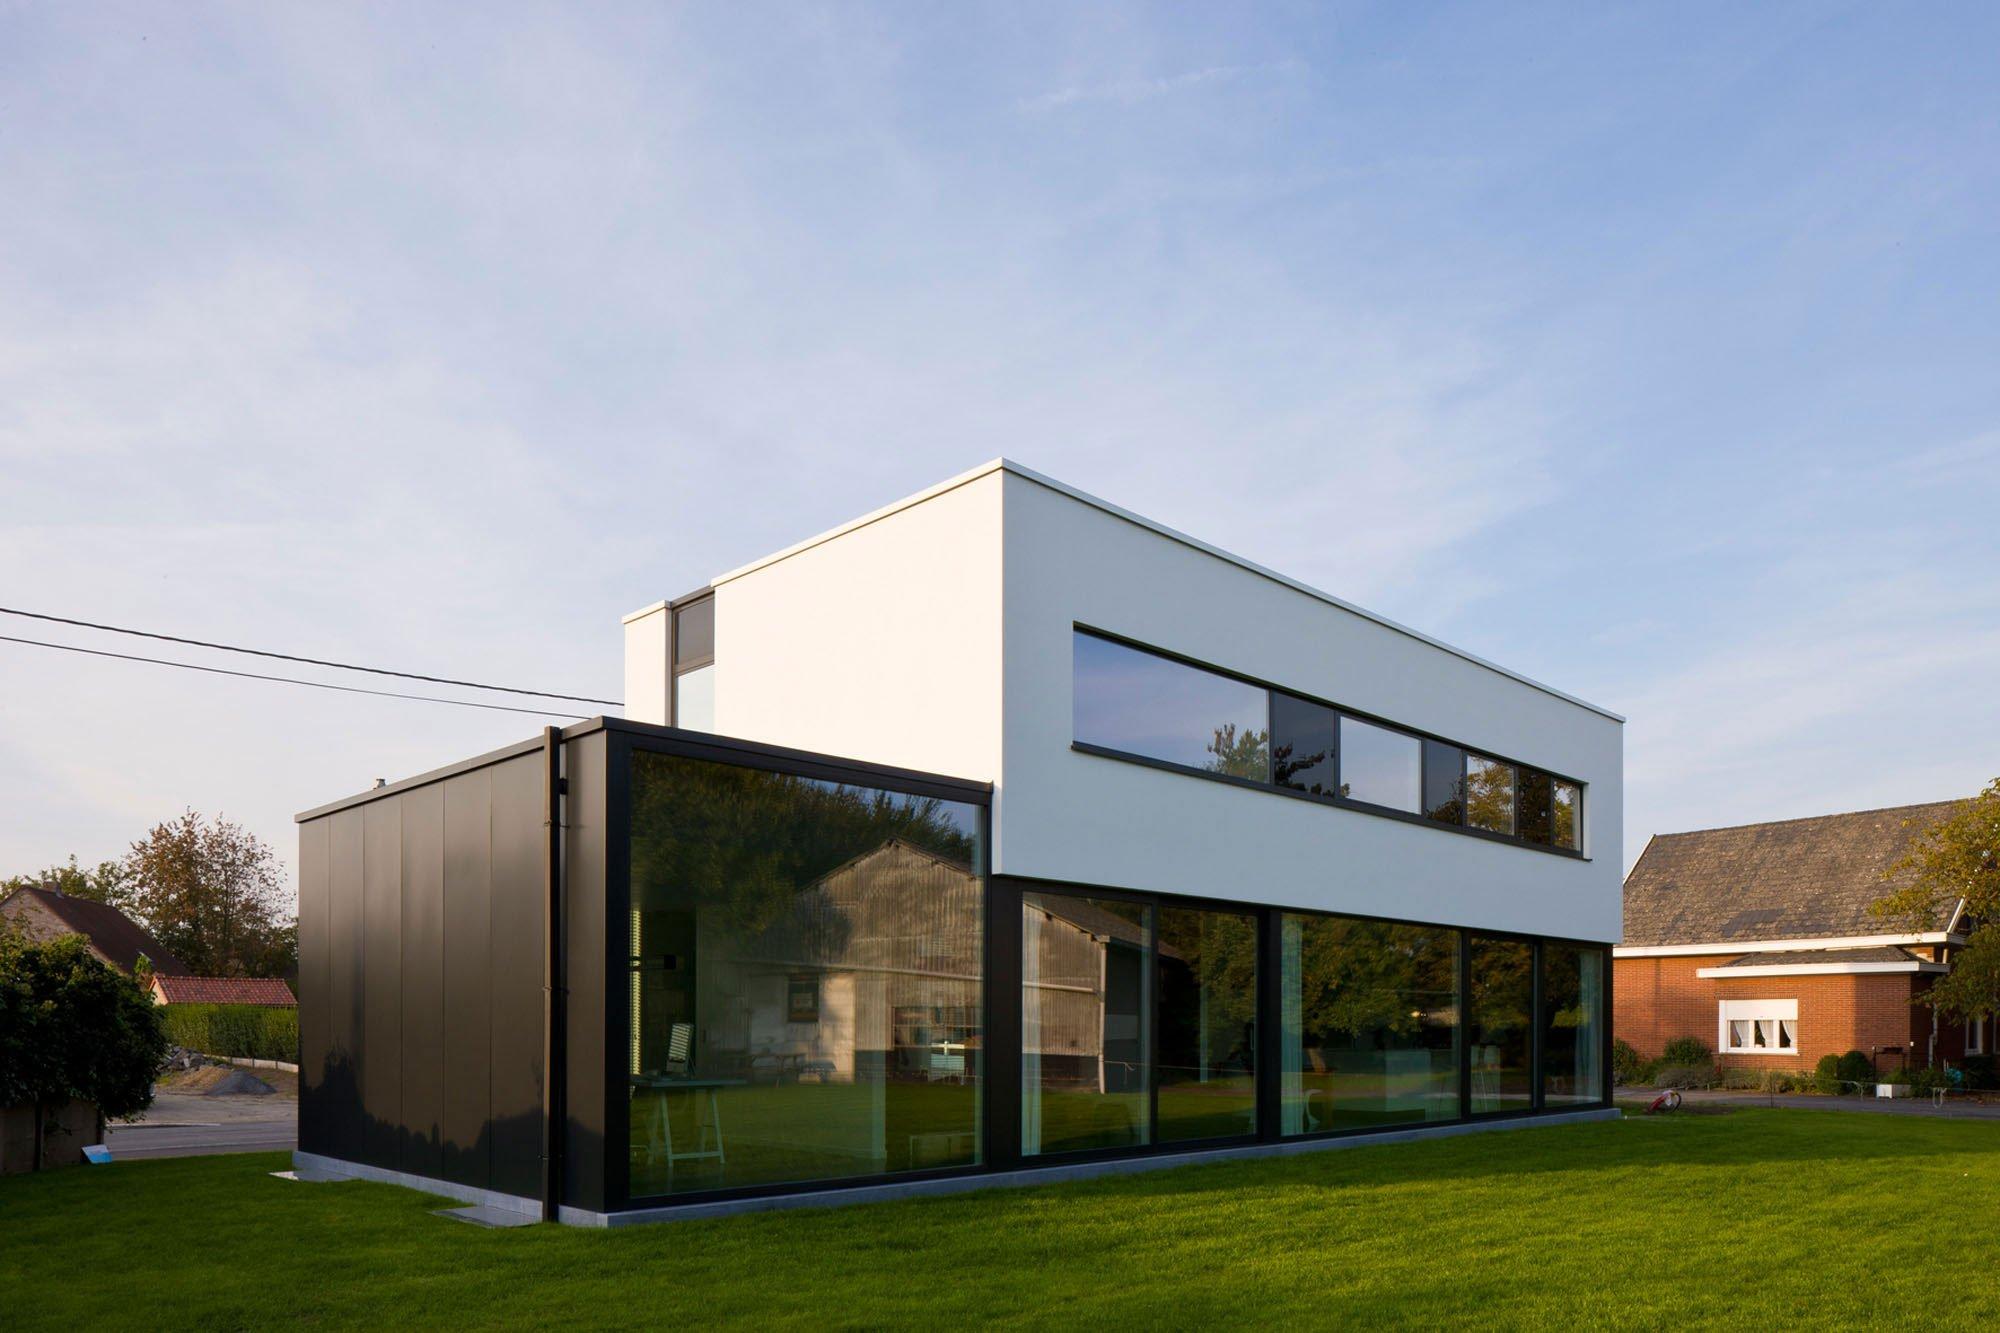 House-WR-01